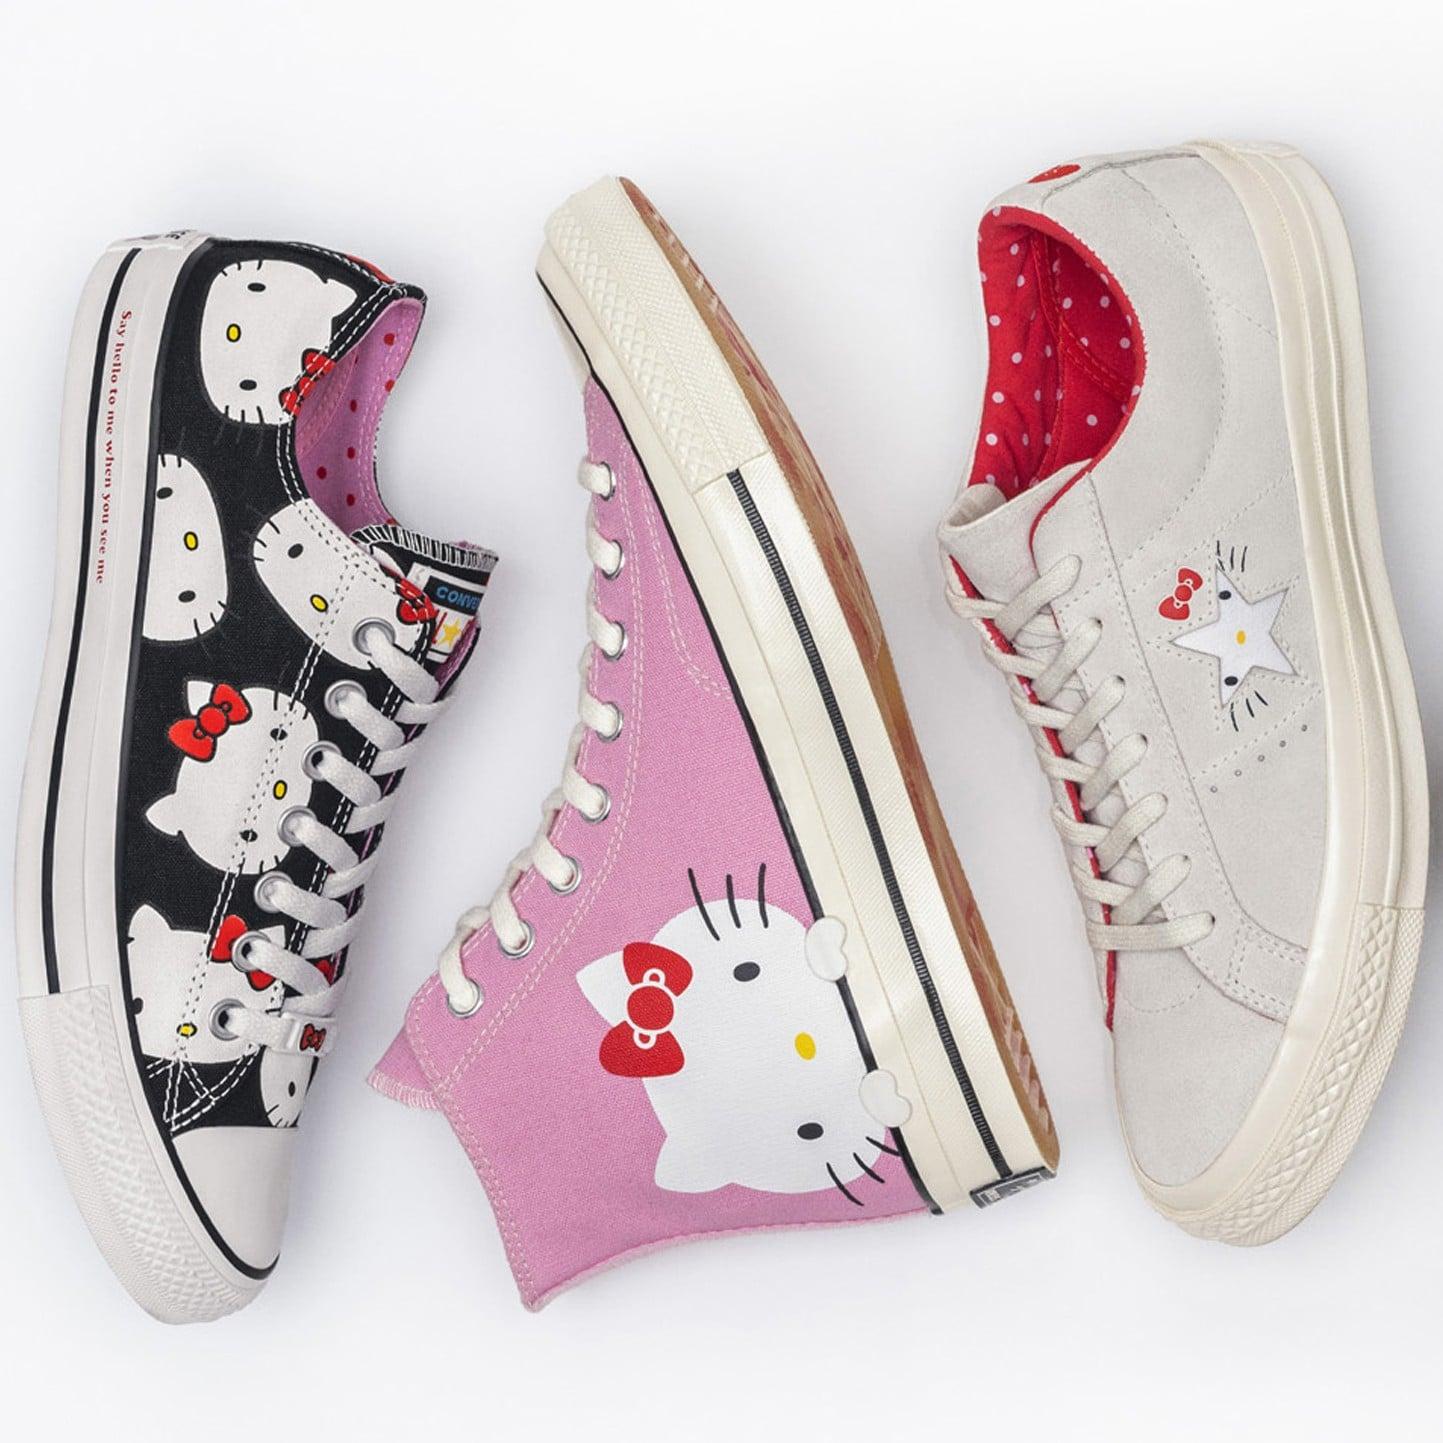 df38871e645aab Hello Kitty x Converse Collaboration